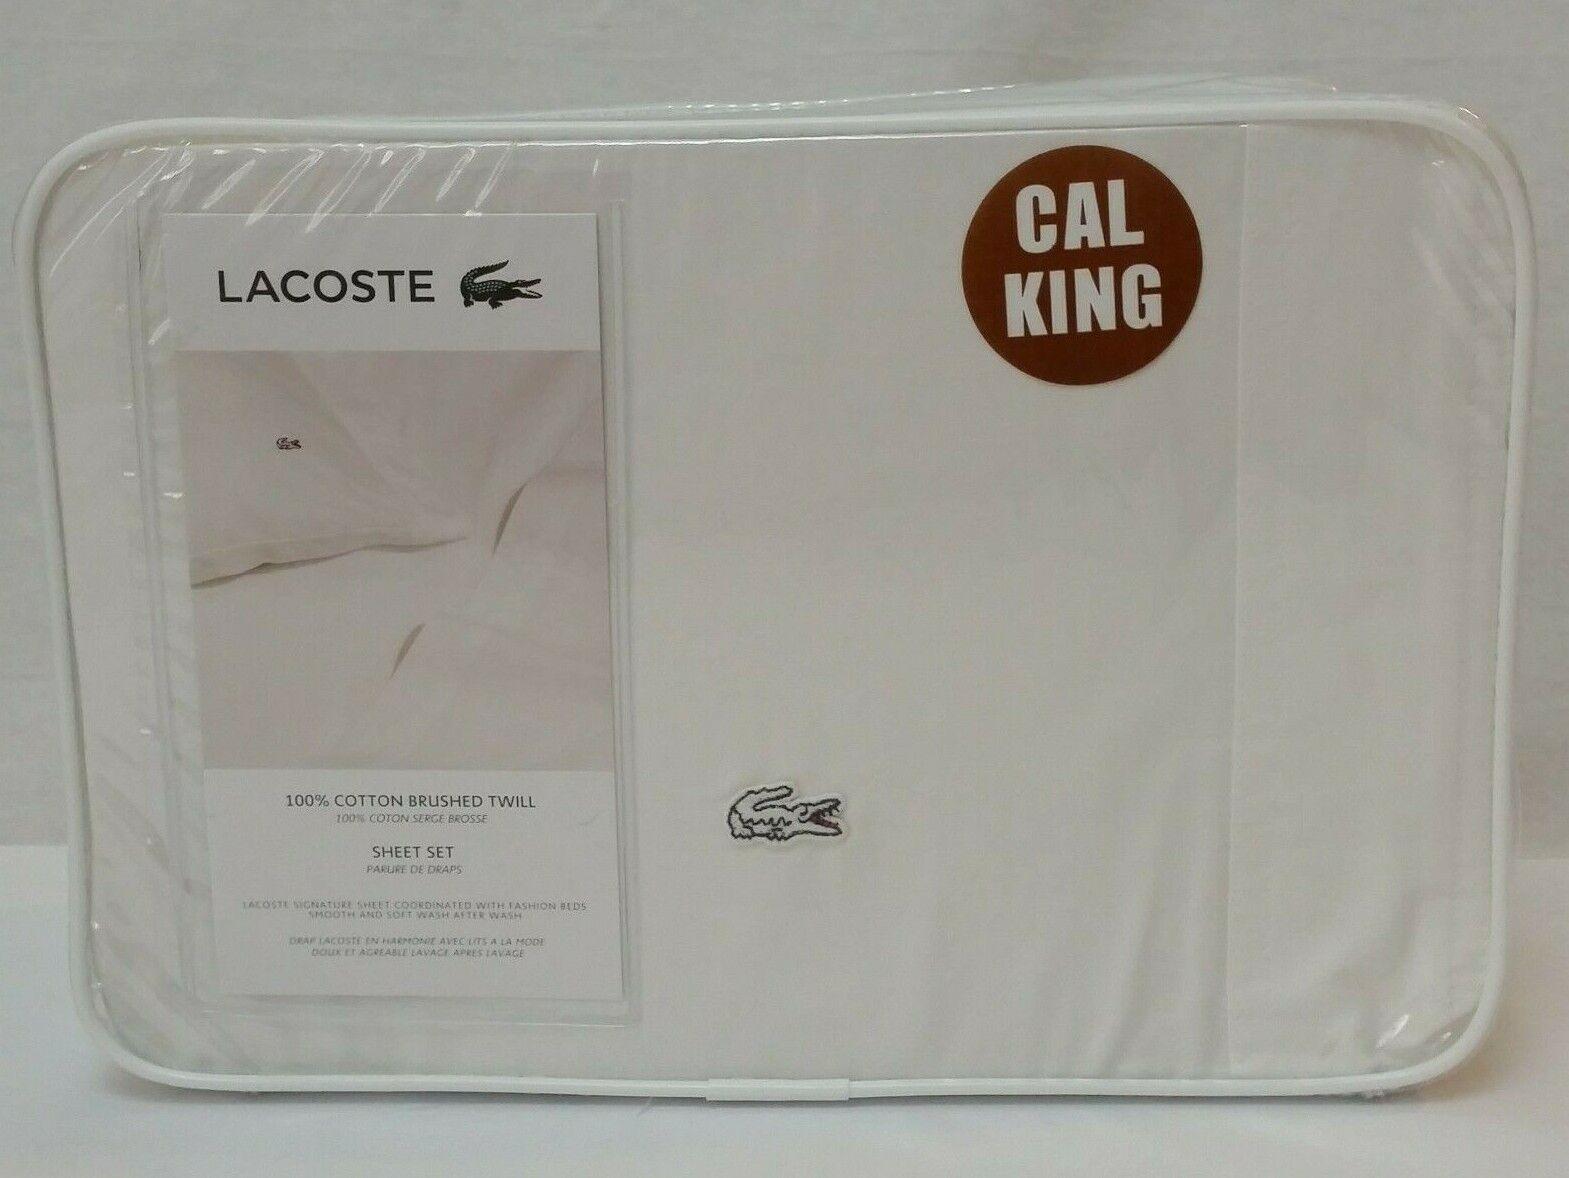 Lacoste Brushed Twill Grey King Sheet Sets For Sale Online Ebay